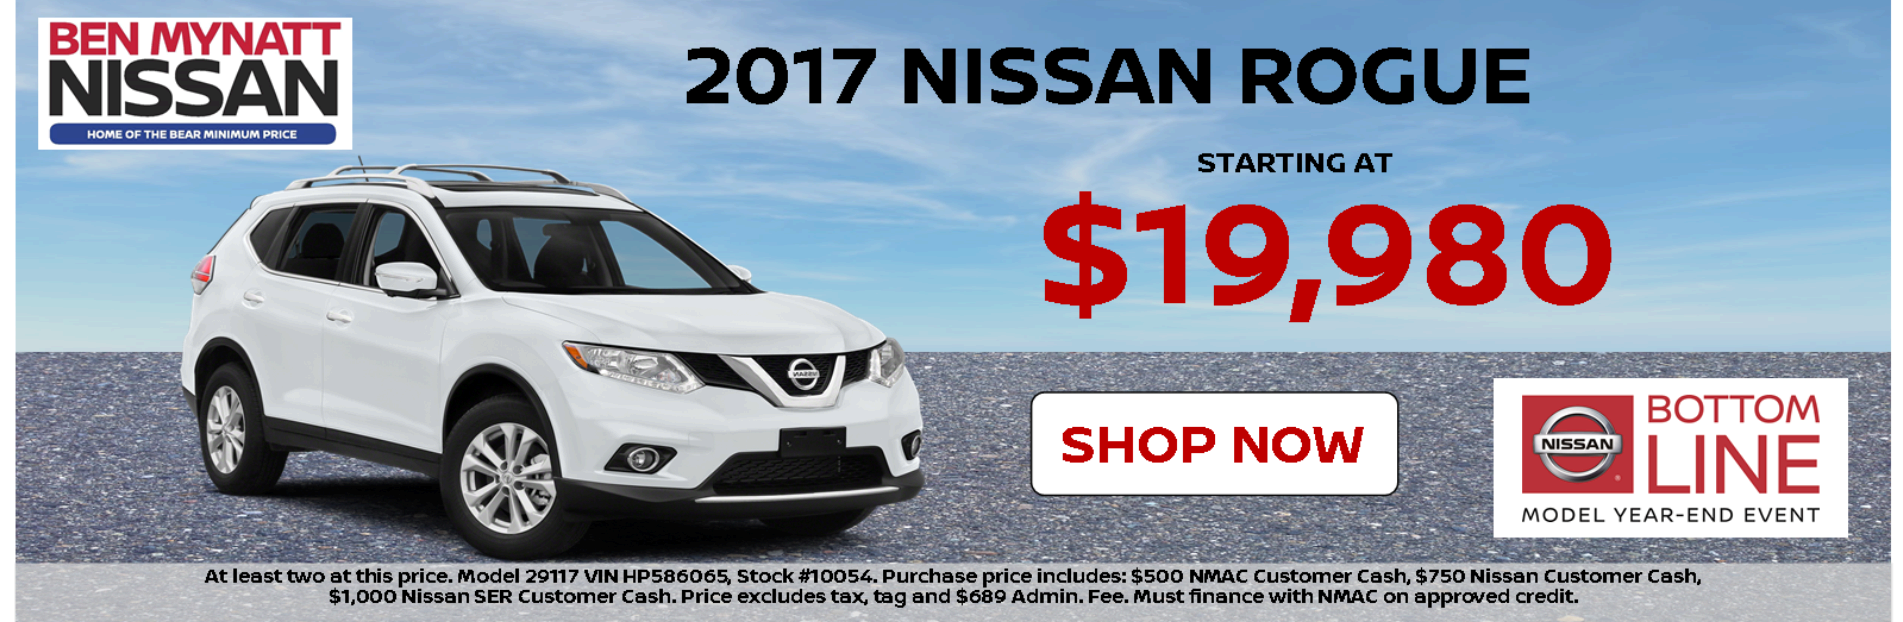 Precision Z Service Nissan And Infiniti Repair Infiniti And. Auto ...